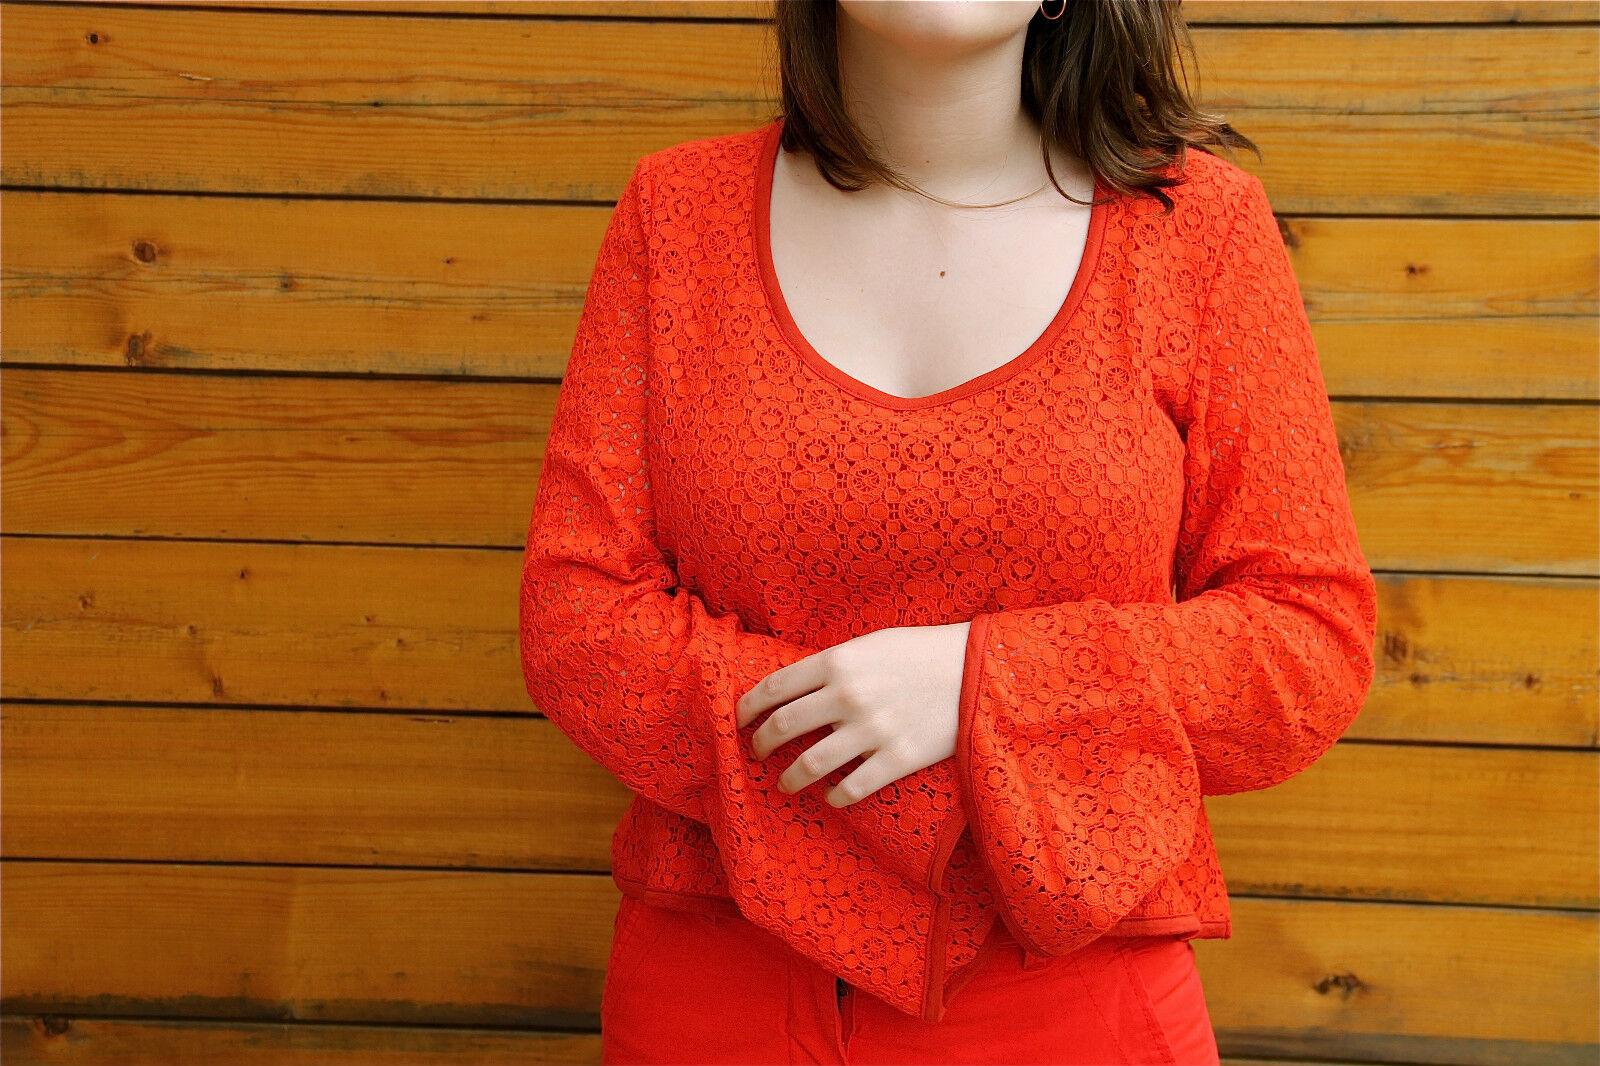 Pull crochet 100% modal KANABEACH margueritte size 38  valeur